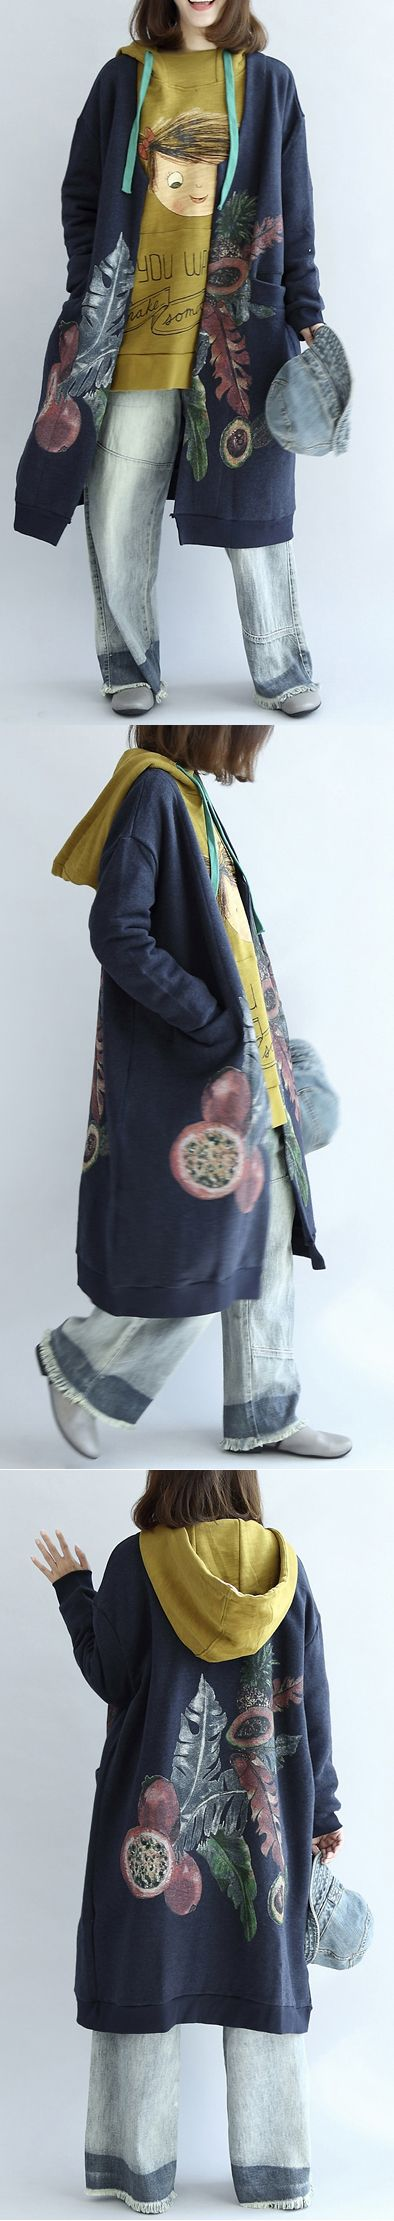 Vintage-blue-prints-cotton-cardigans-plus-size-v-neck-long-sleeve-trench-coats